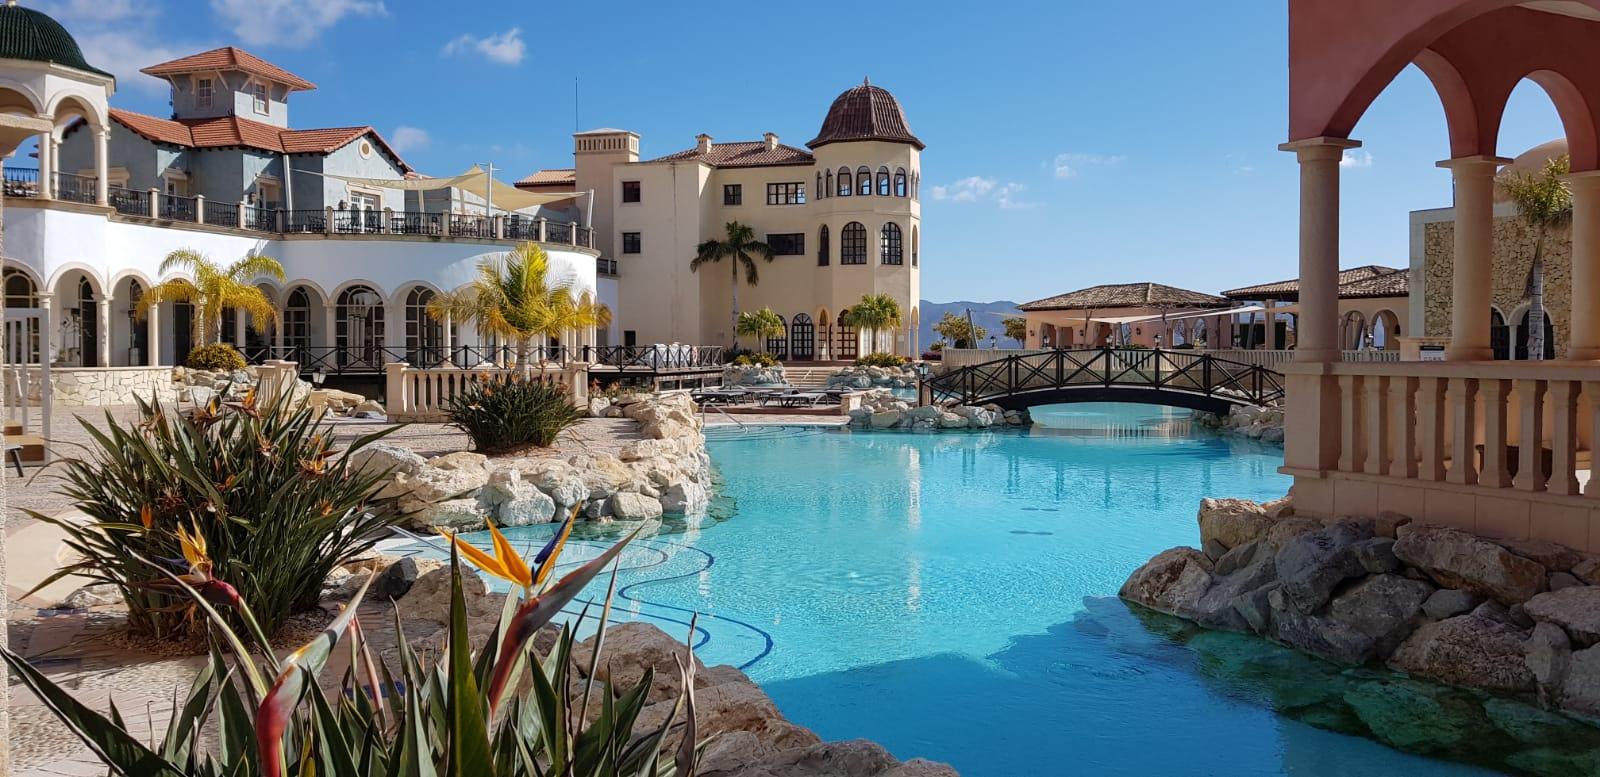 Piscina del hotel Villaitana de Benidorm